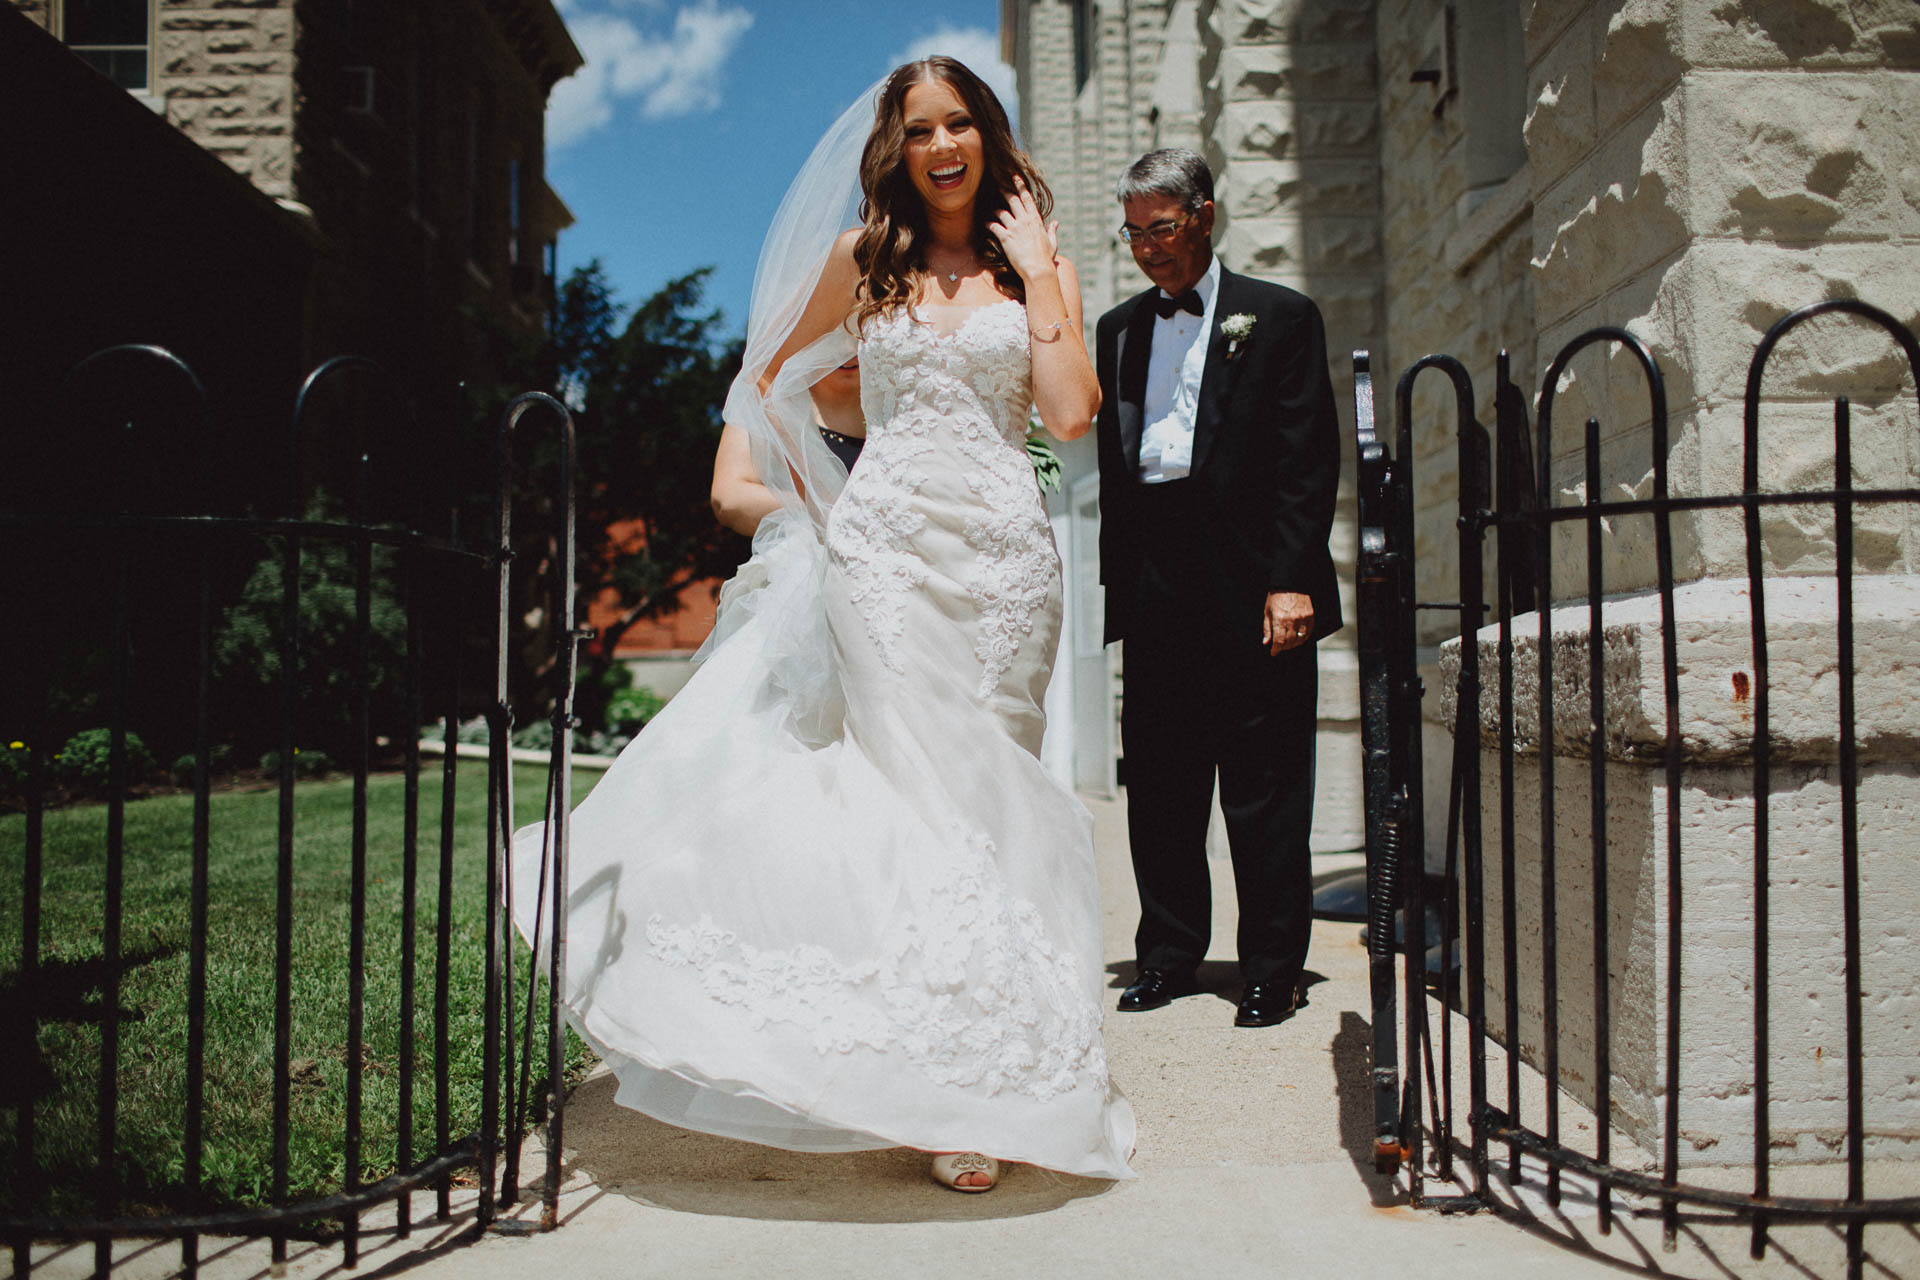 Keri-Joseph-Top-of-the-Market-Wedding-055@2x.jpg